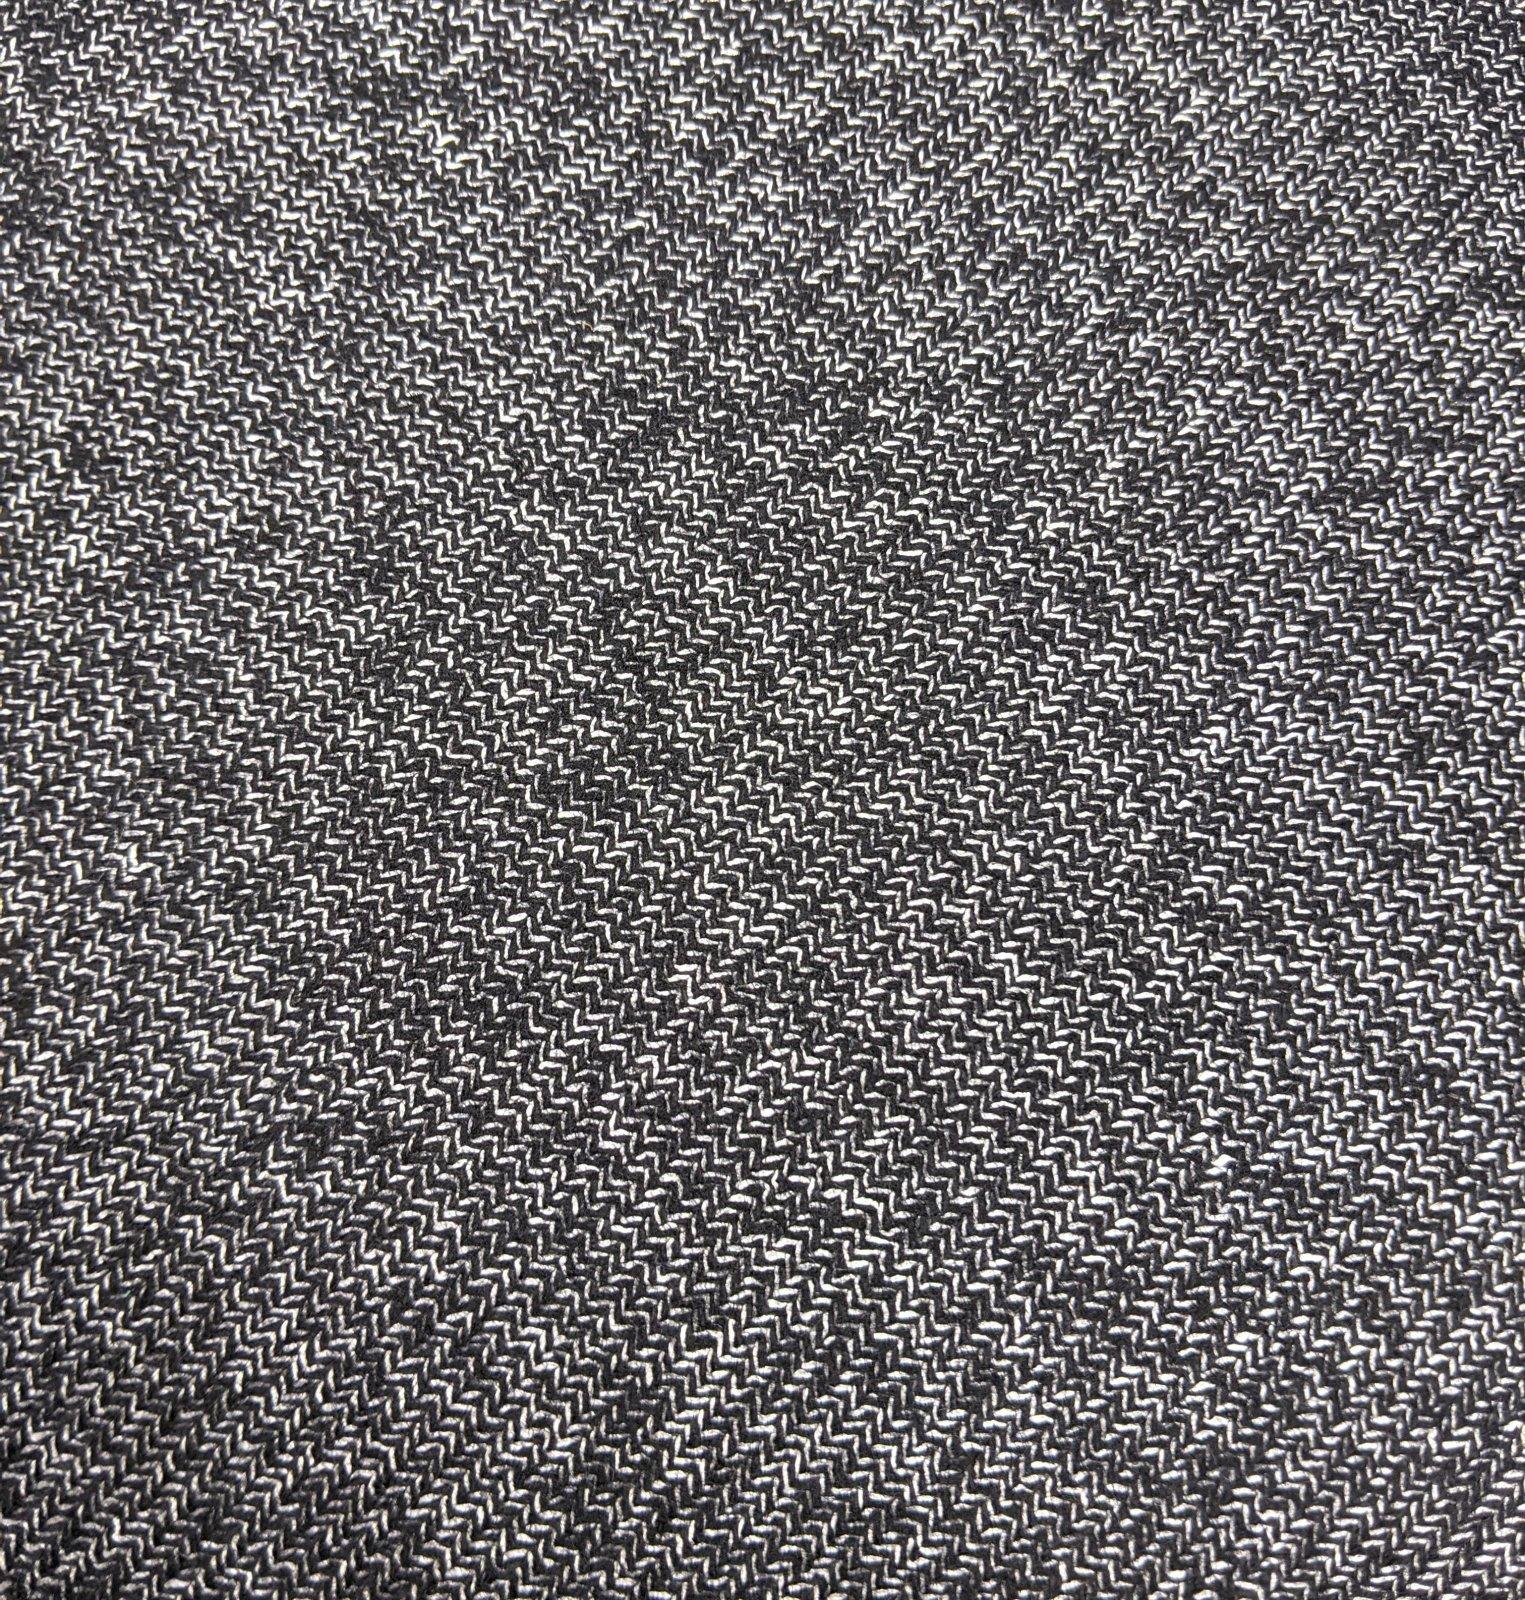 EB Italian Black & White Wool Silk Blend Suiting